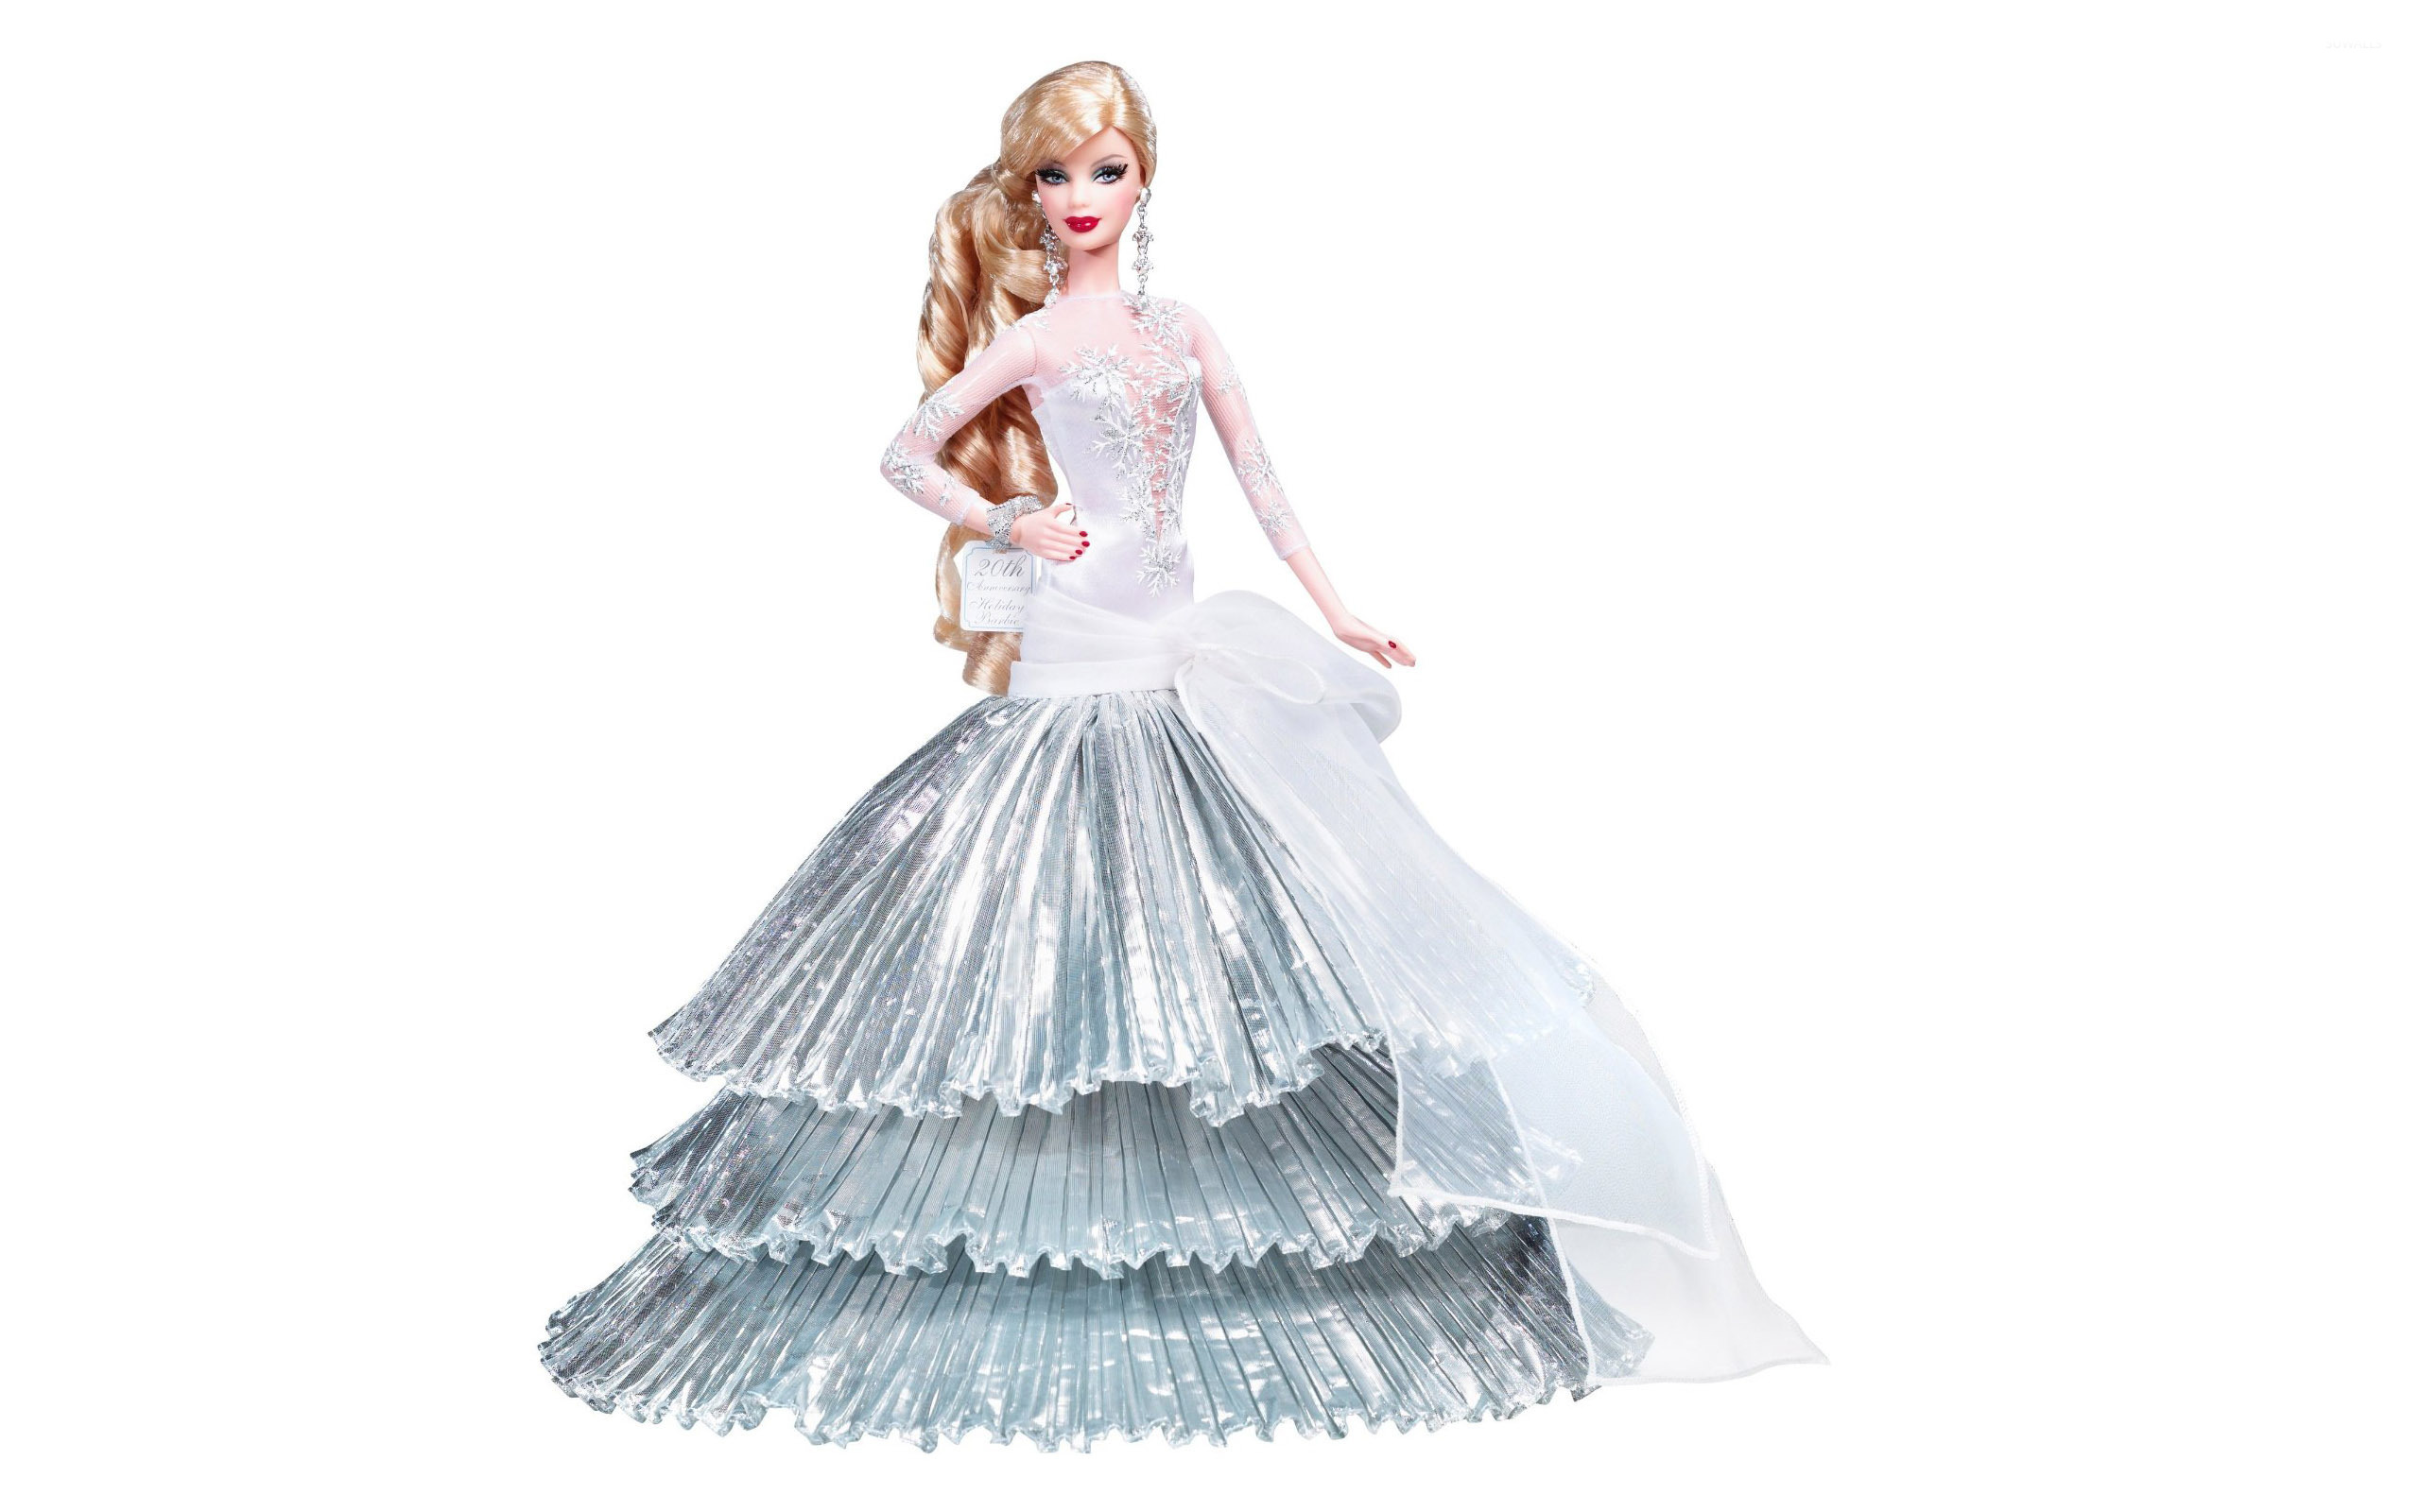 Diva Barbie Wallpaper - Barbie Holiday 2008 , HD Wallpaper & Backgrounds